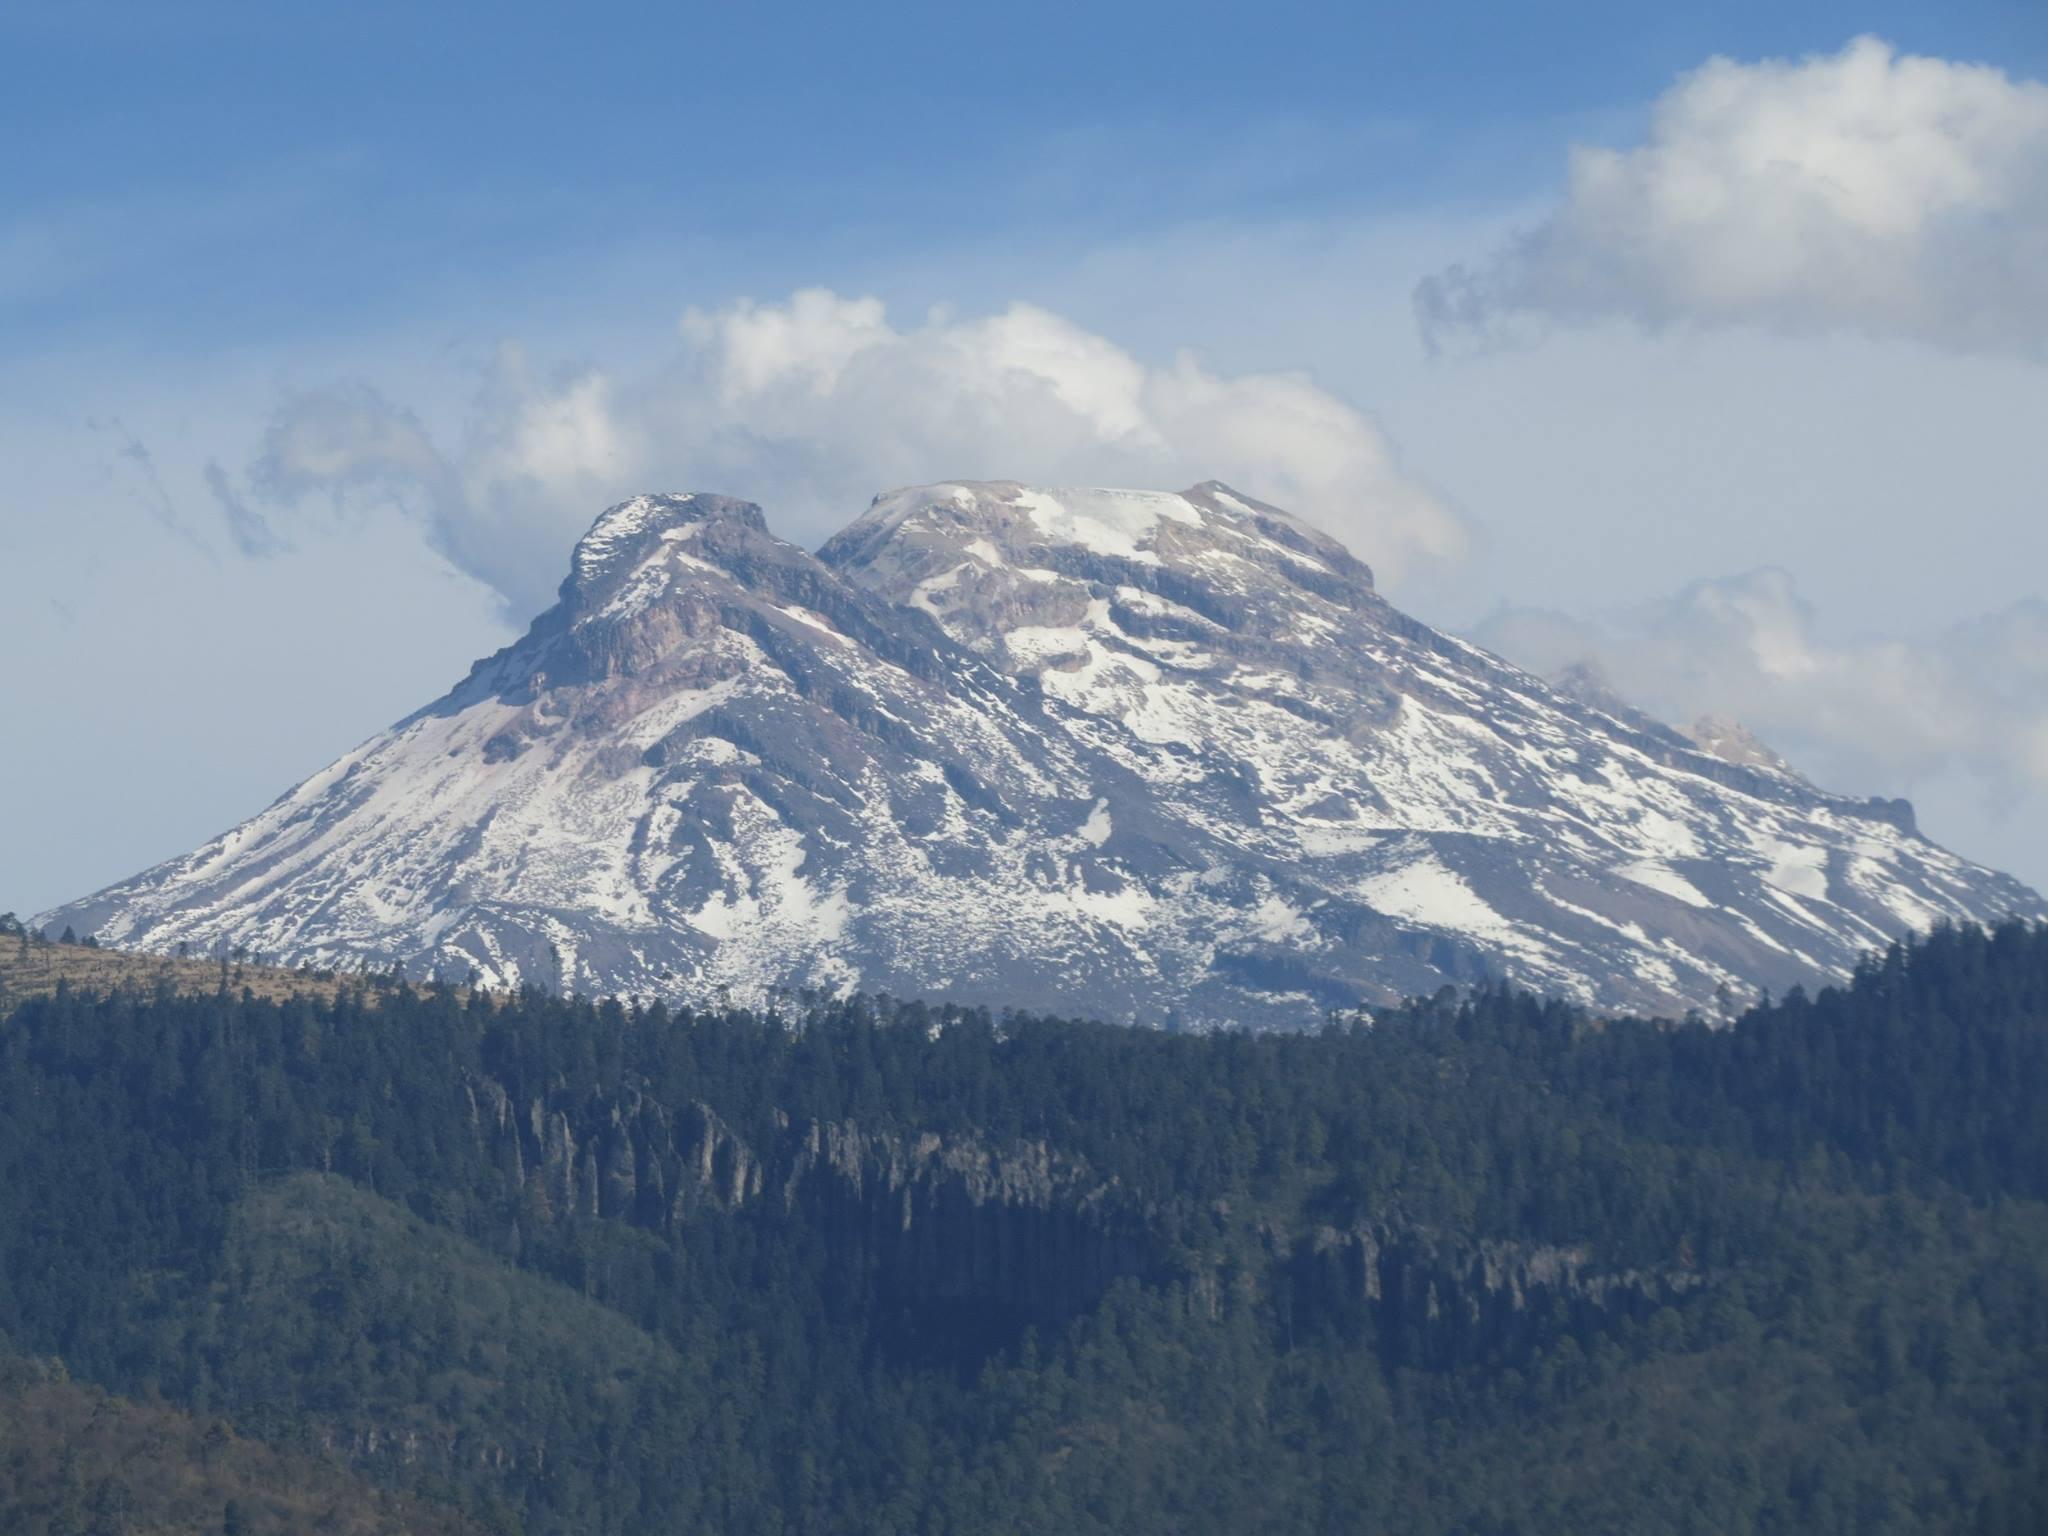 low-angle photo of mountain